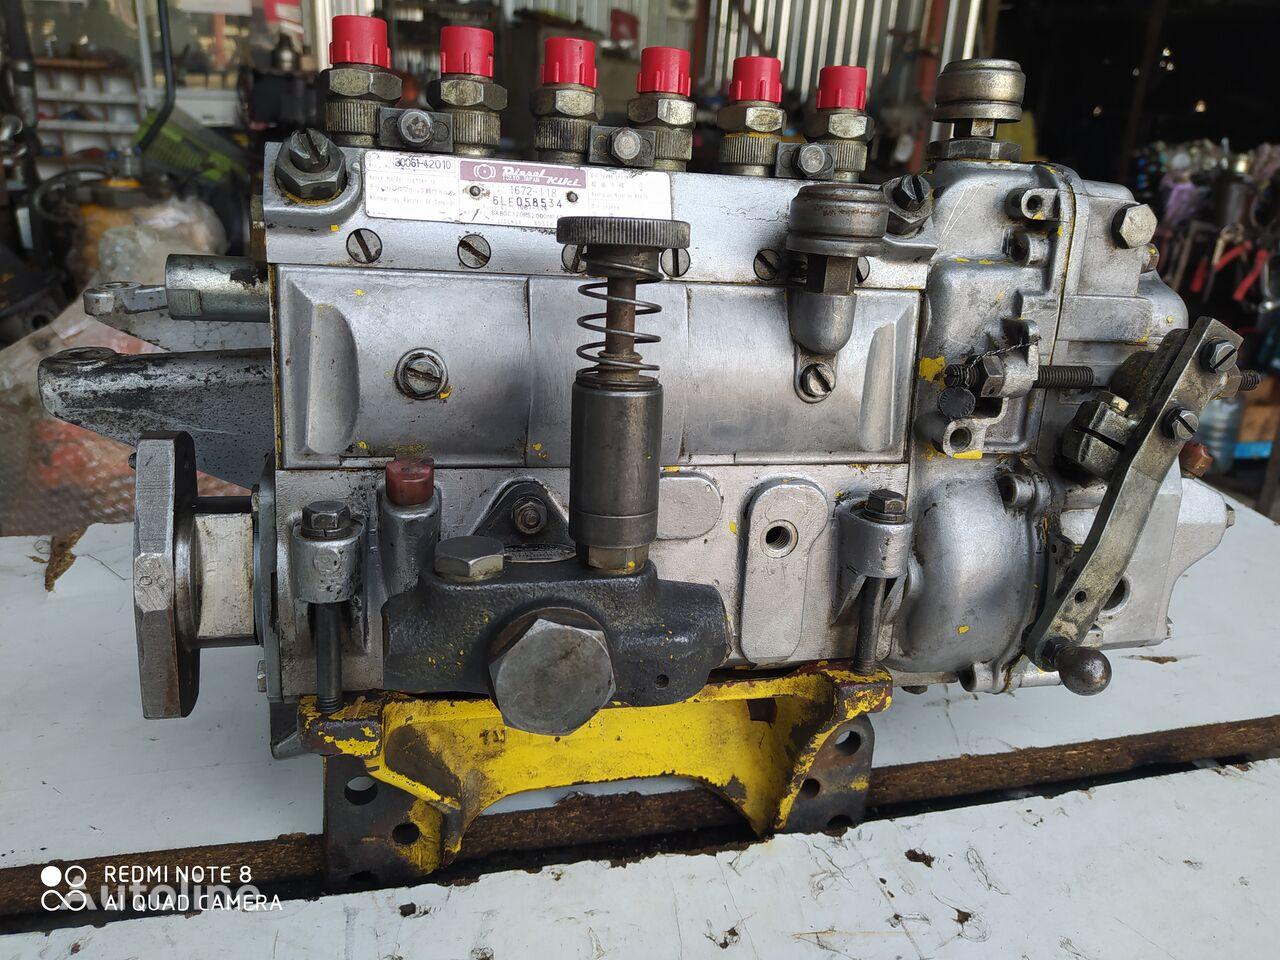 BOSCH 1672-118 (7LE078819) fuel pump for excavator